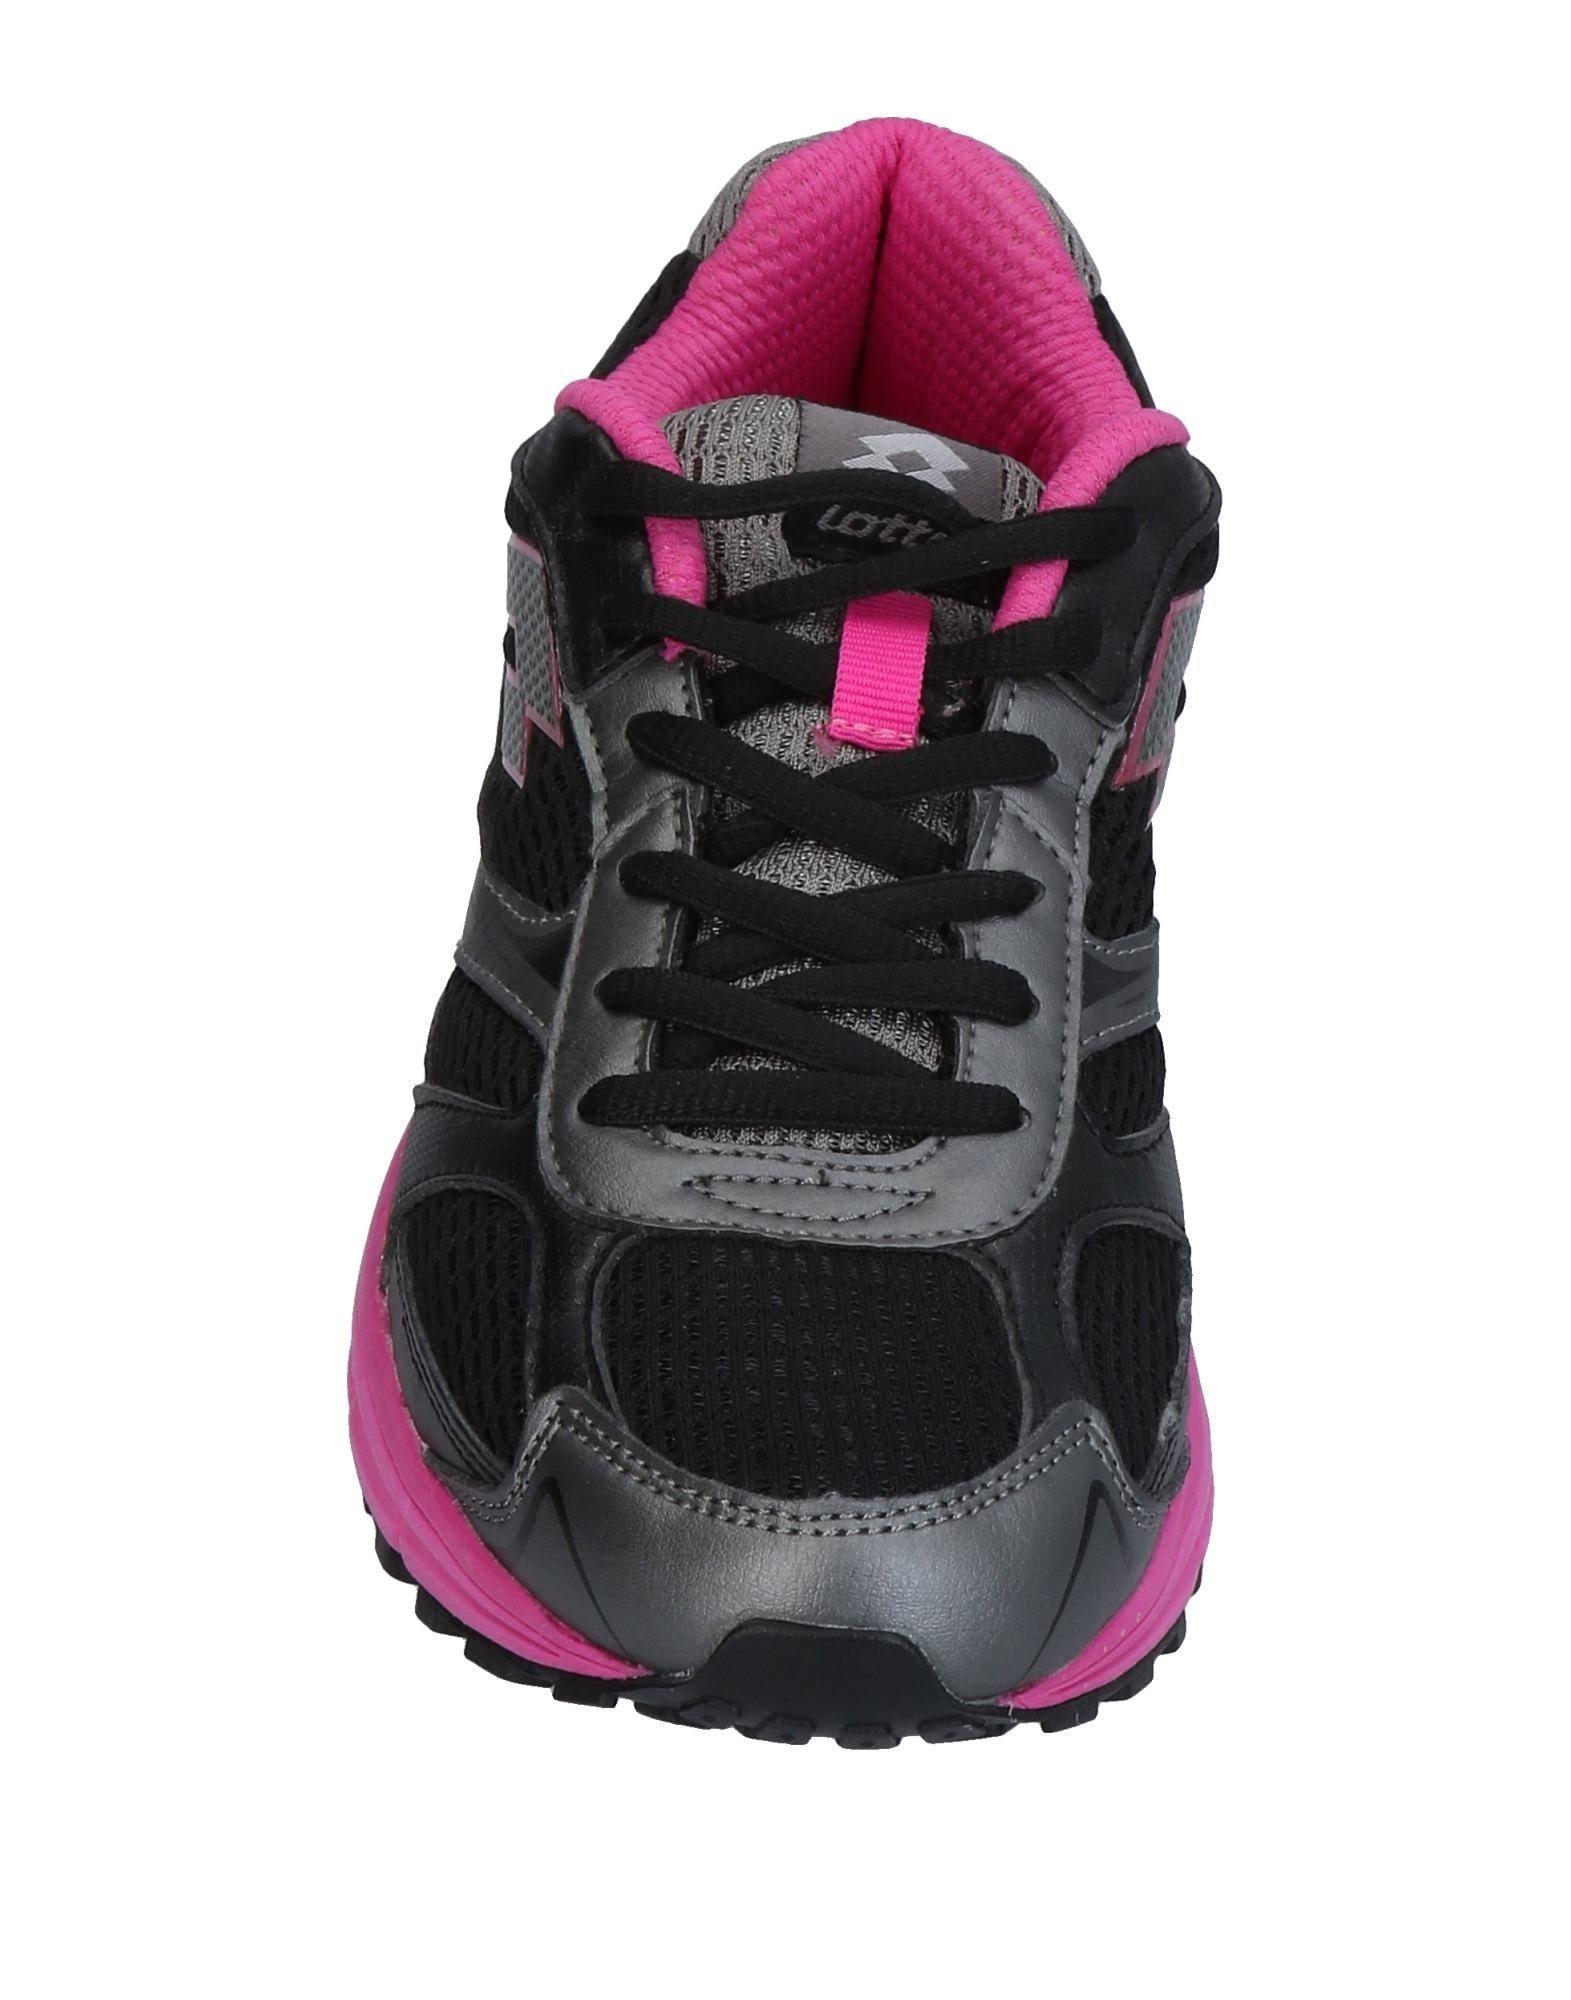 Lotto Leggenda Low-tops & Sneakers in Black